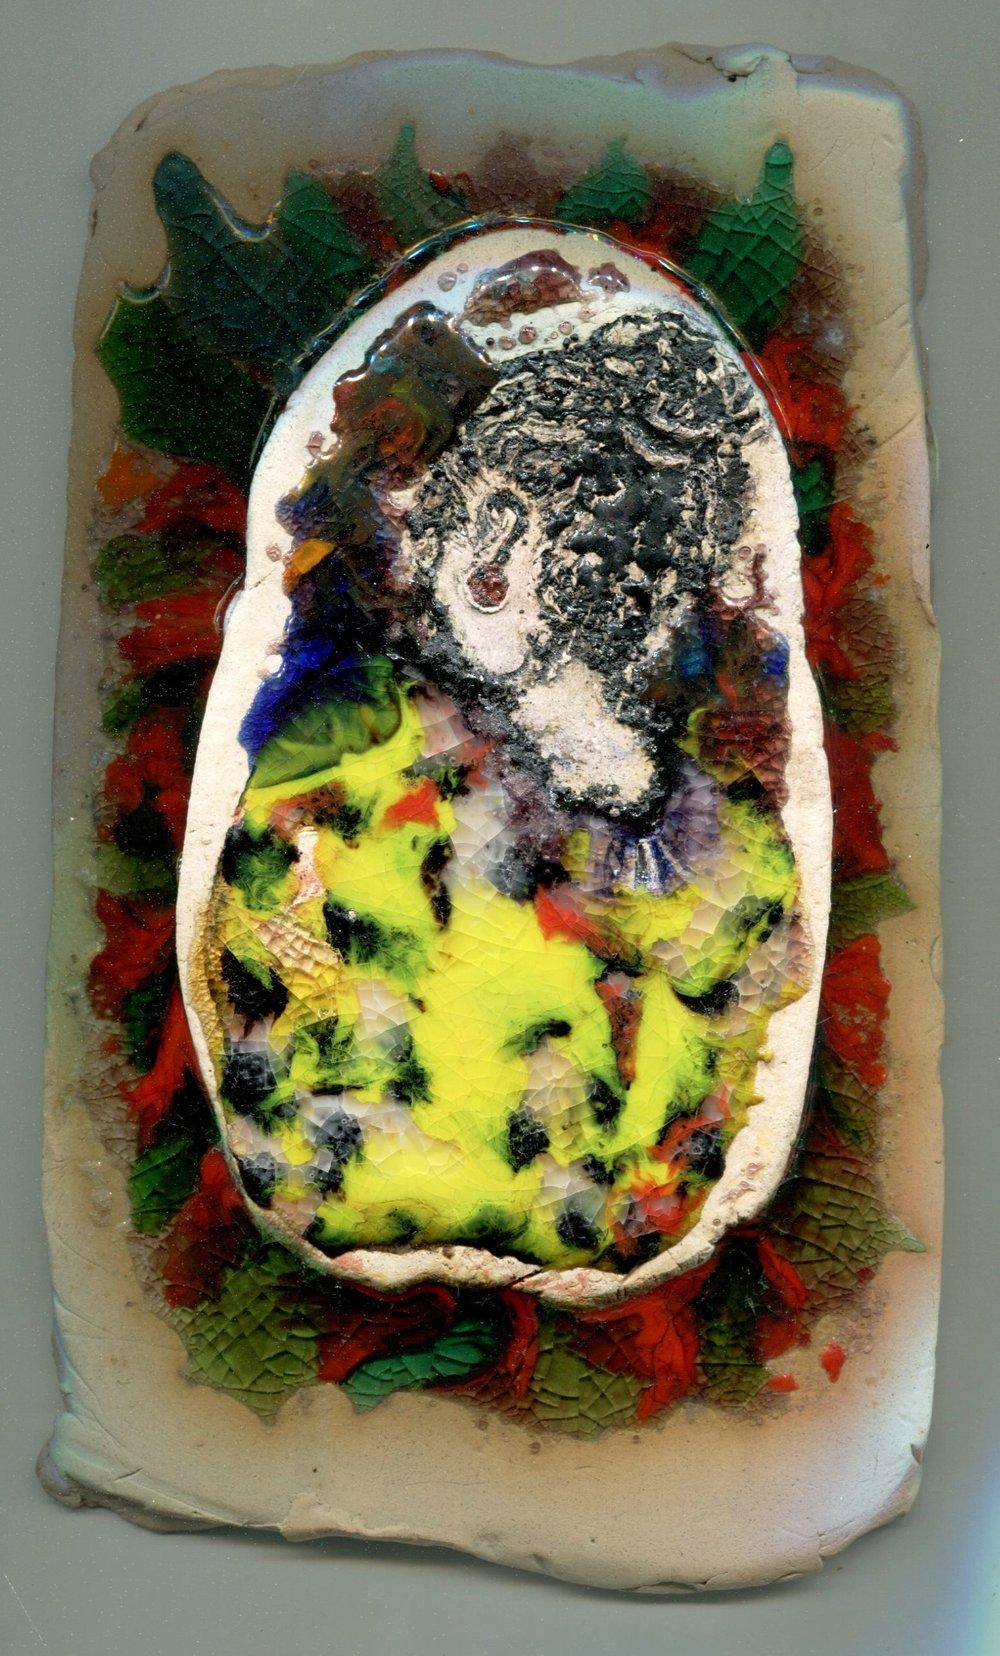 67b Willemien Cilliers, Portrait 2, Ceramic & glass